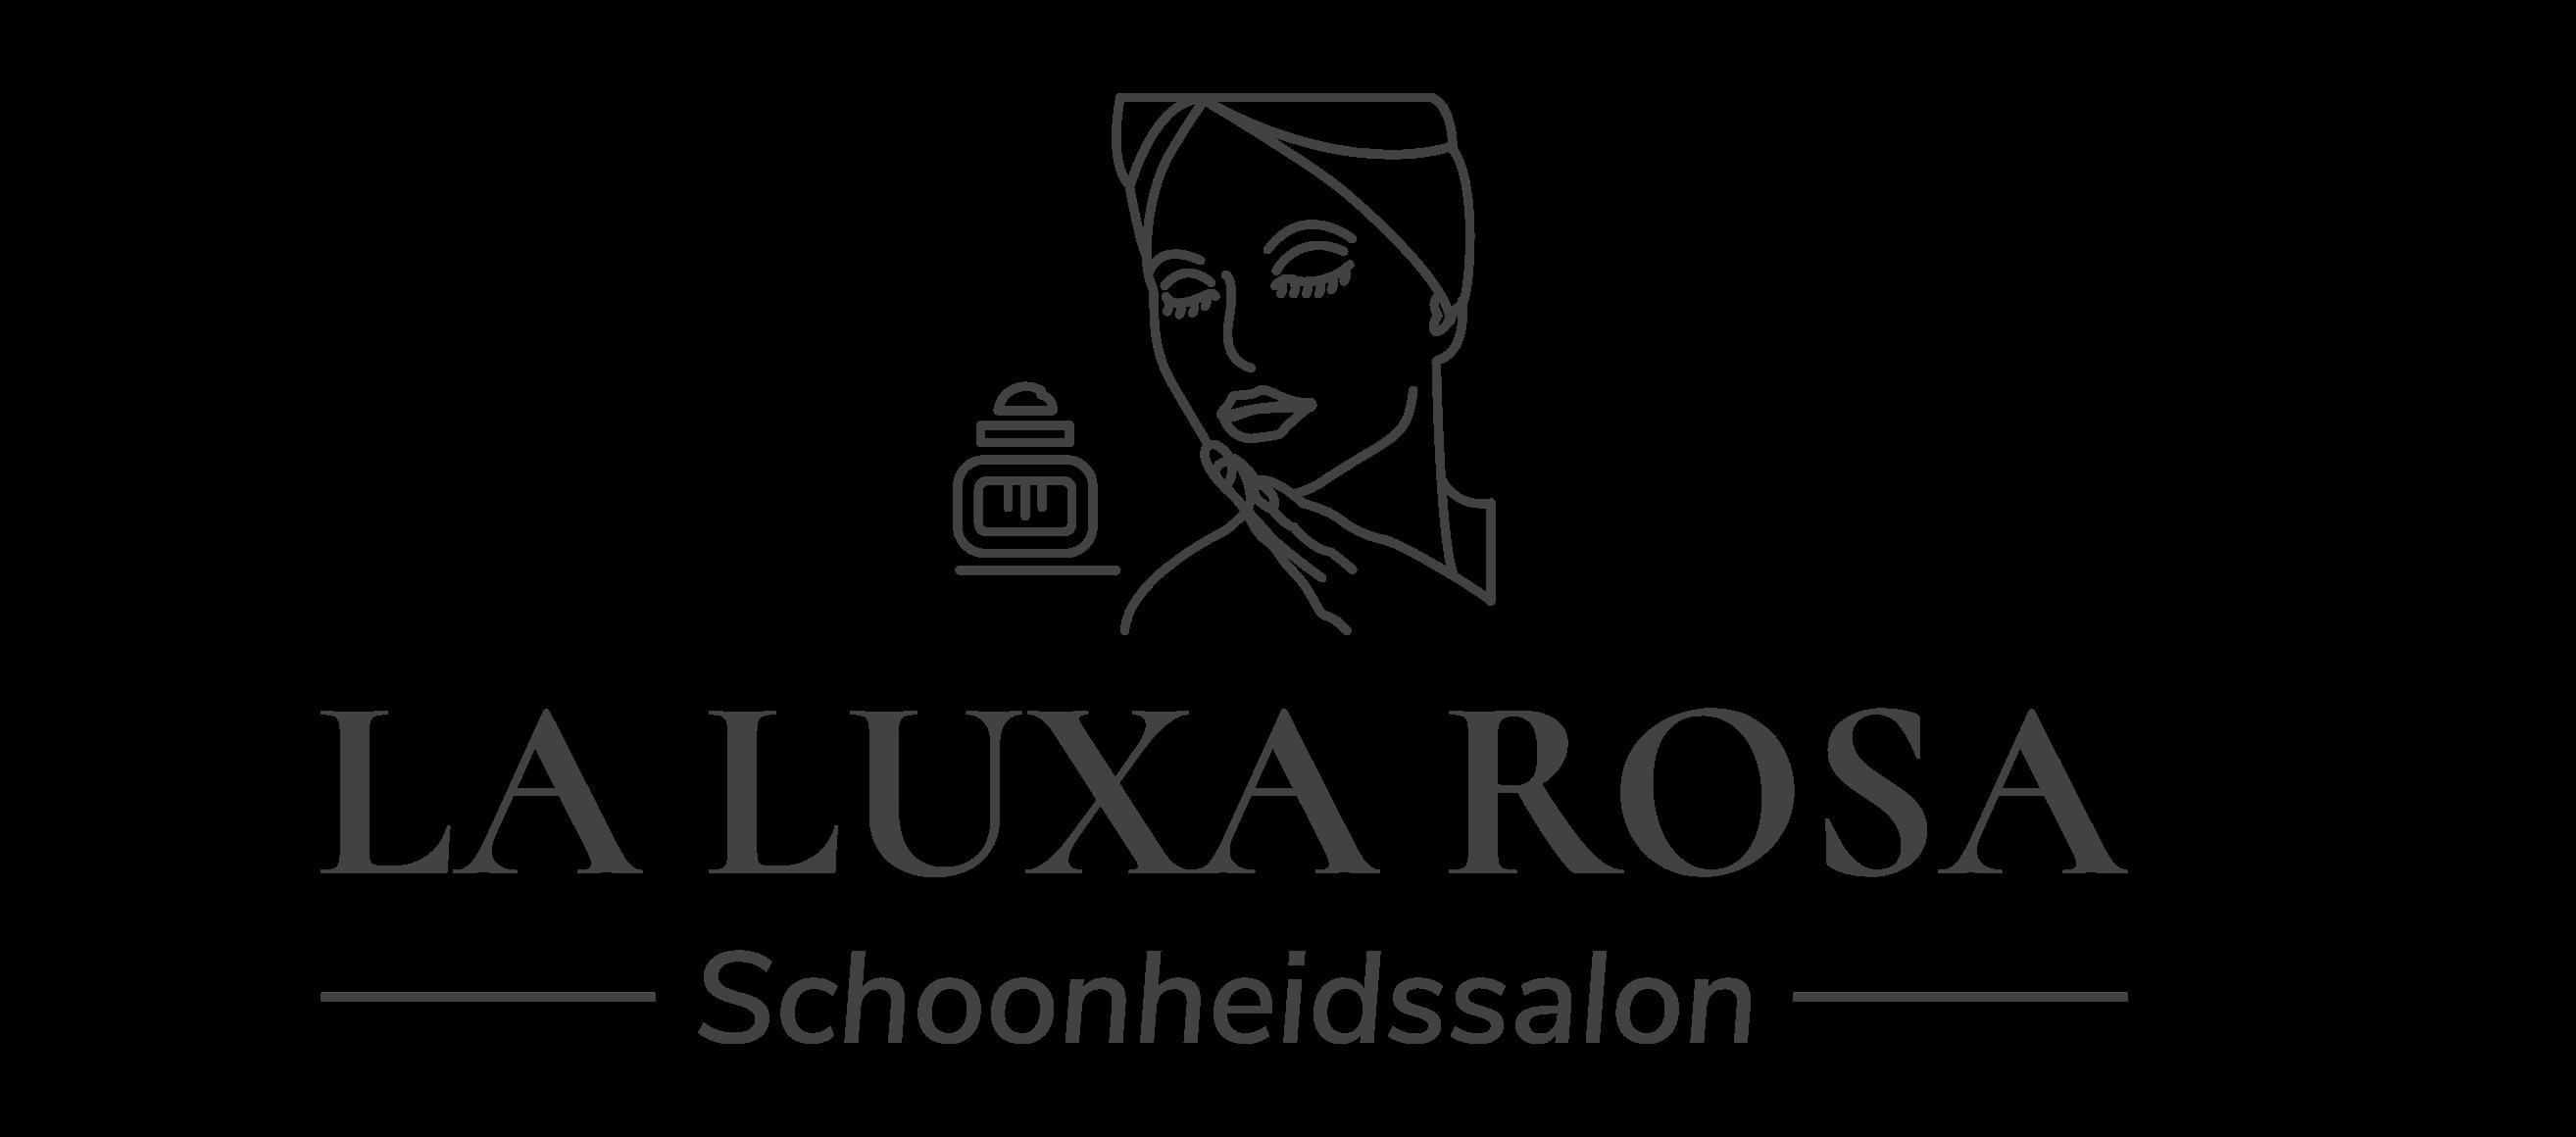 Laluxarosa.nl